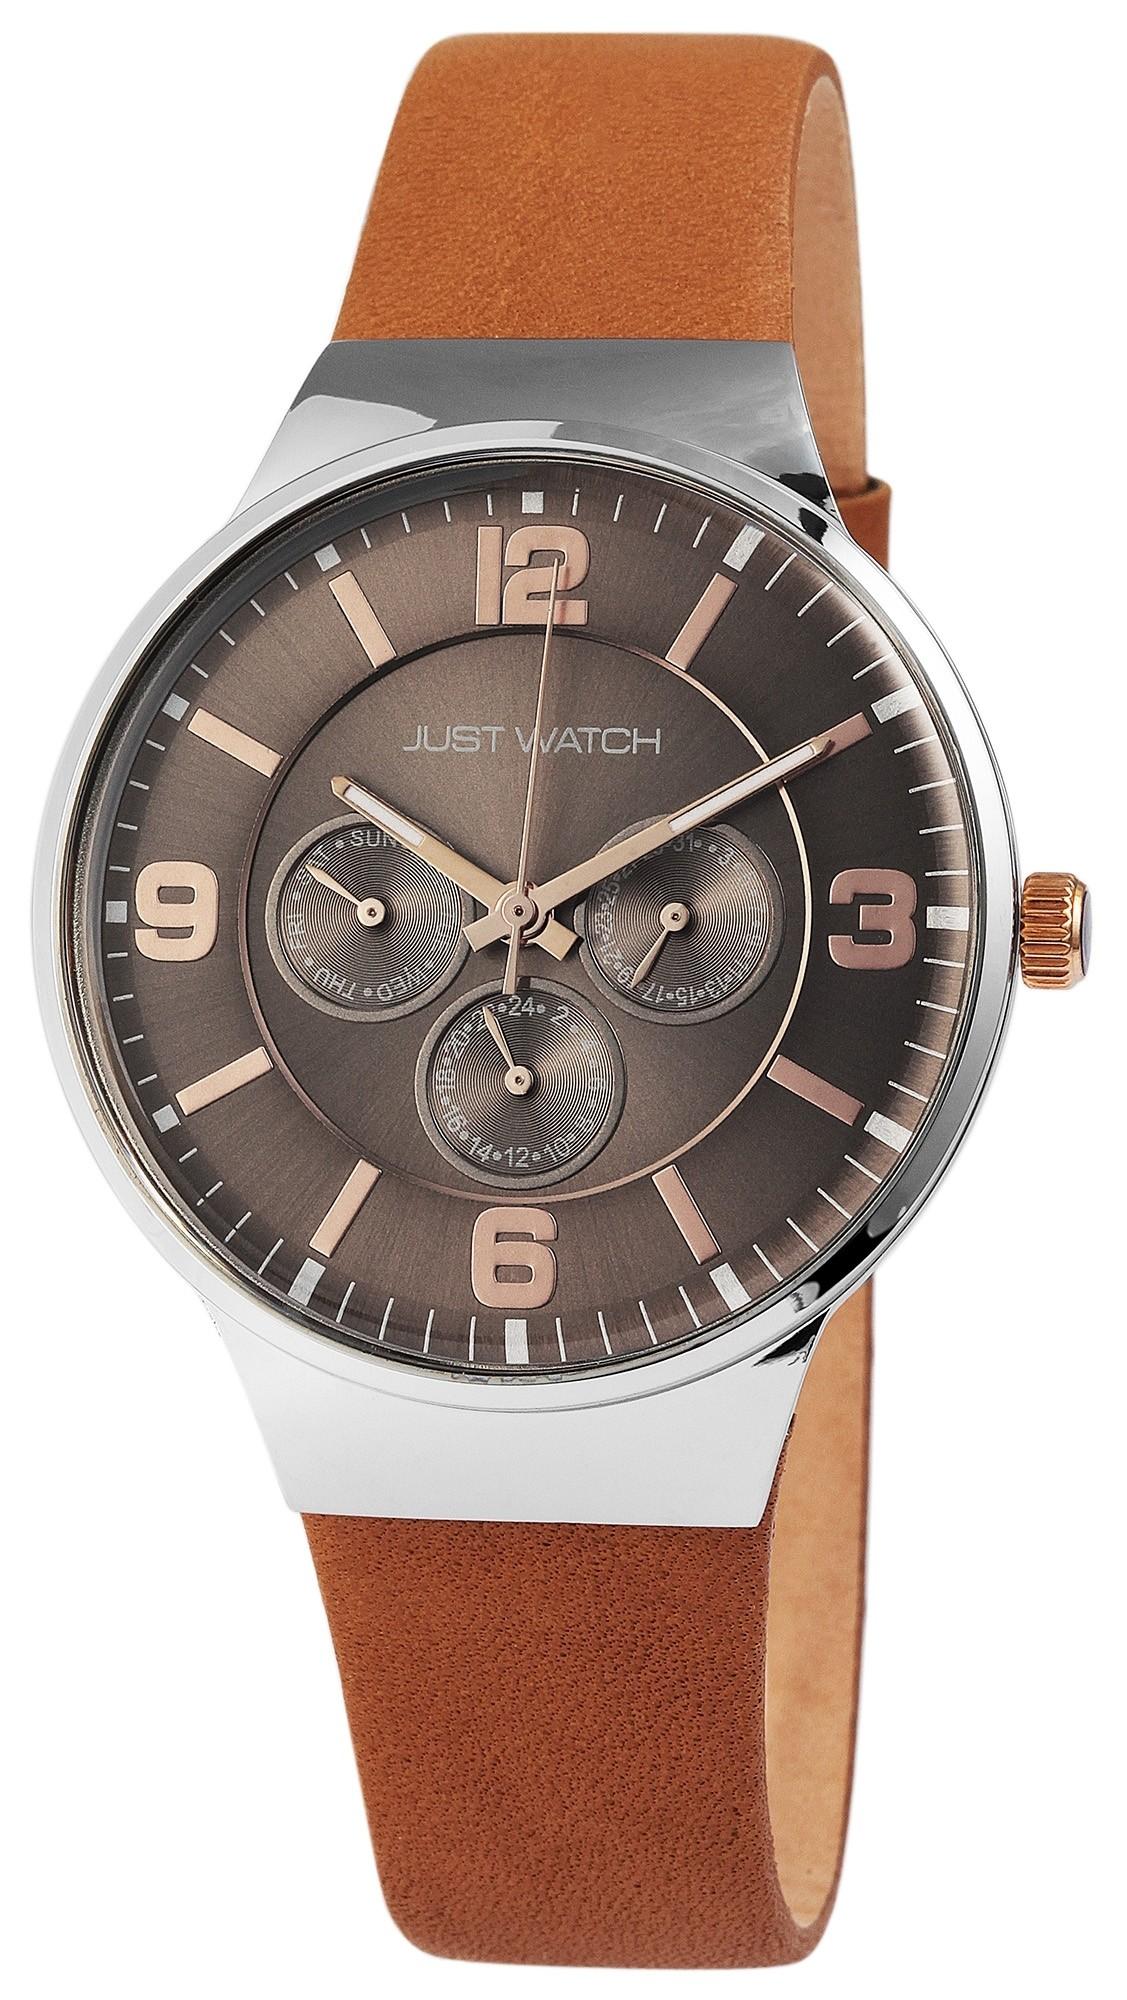 1e1bf4a2a Unisex hodinky JUST WATCH JW20023-003 - Tiki.sk